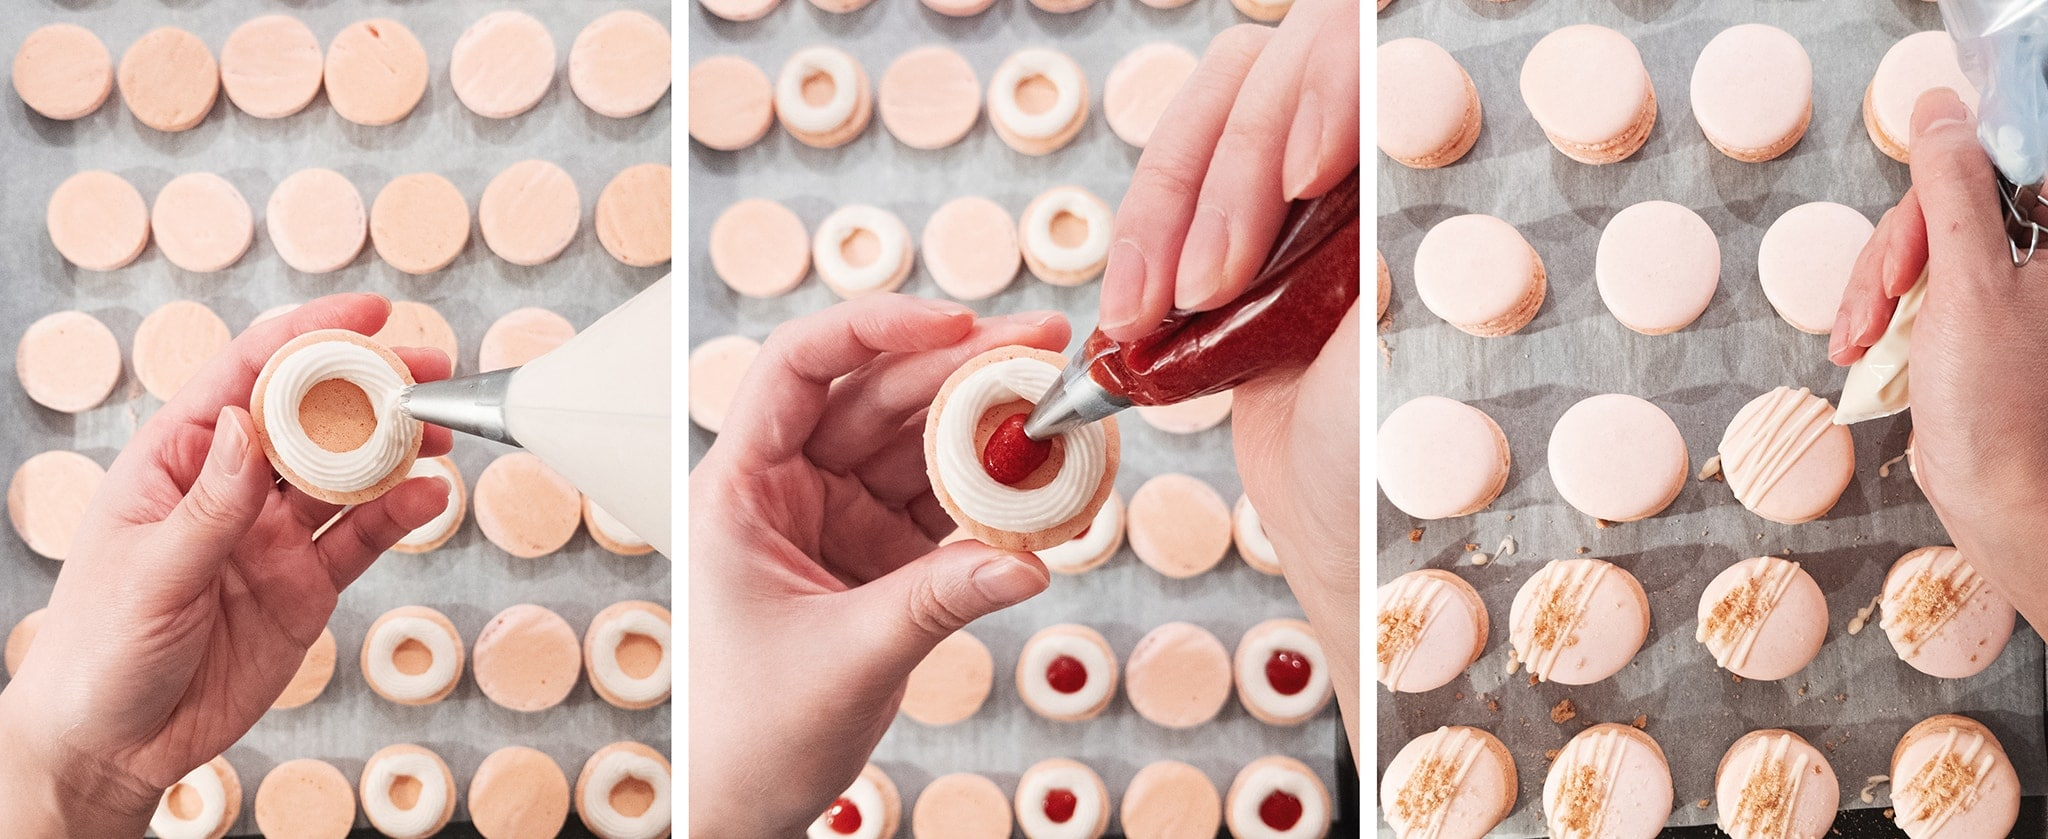 piping filling onto macaron shells